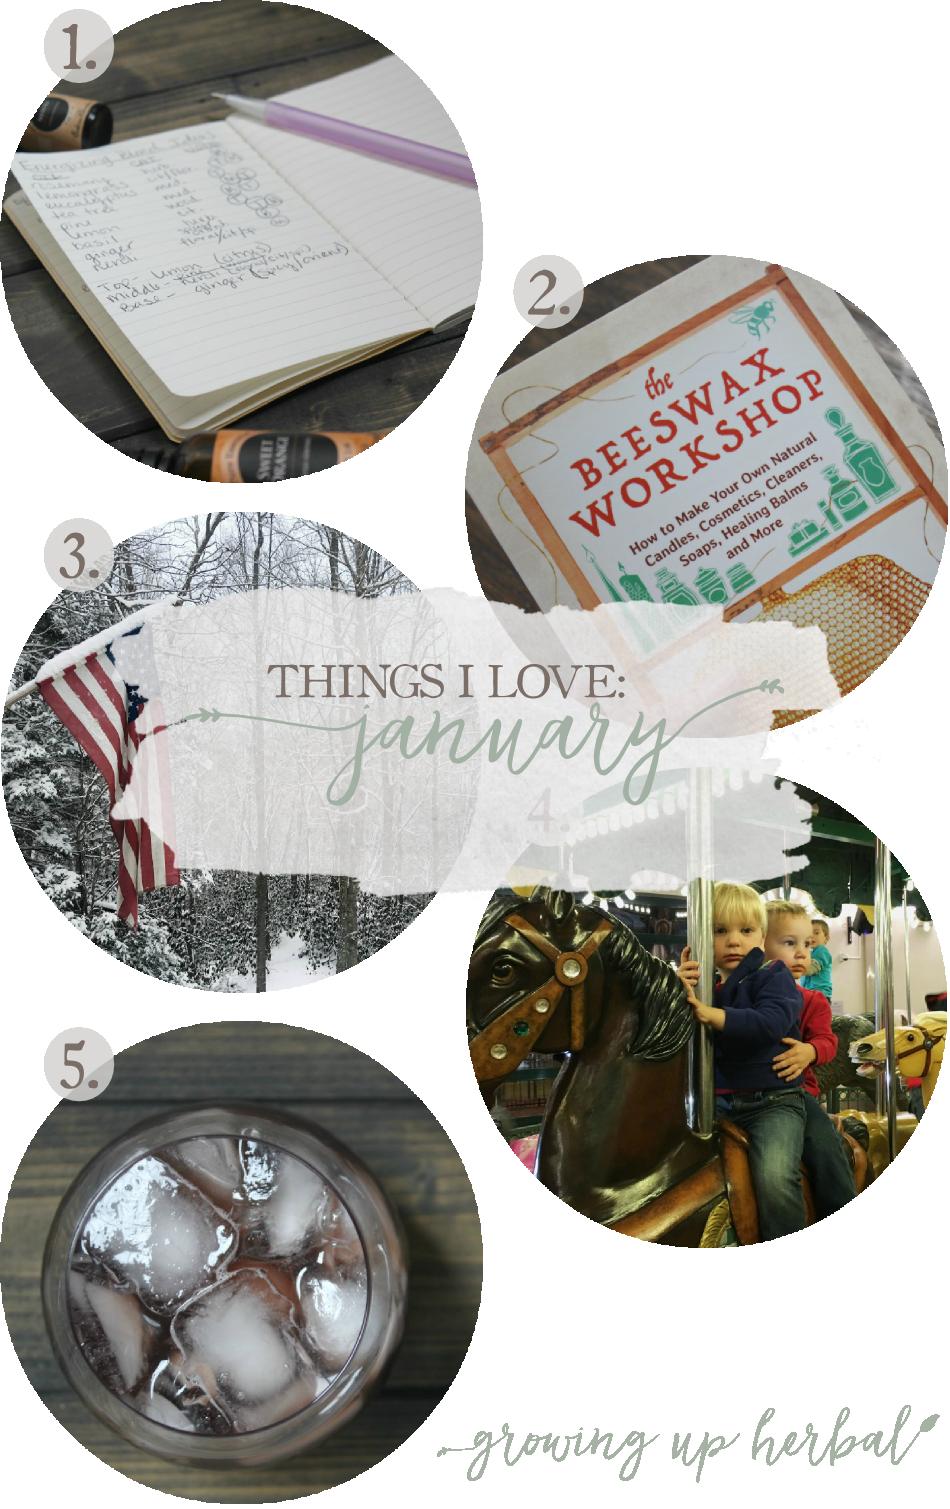 Things I Love: January 2017